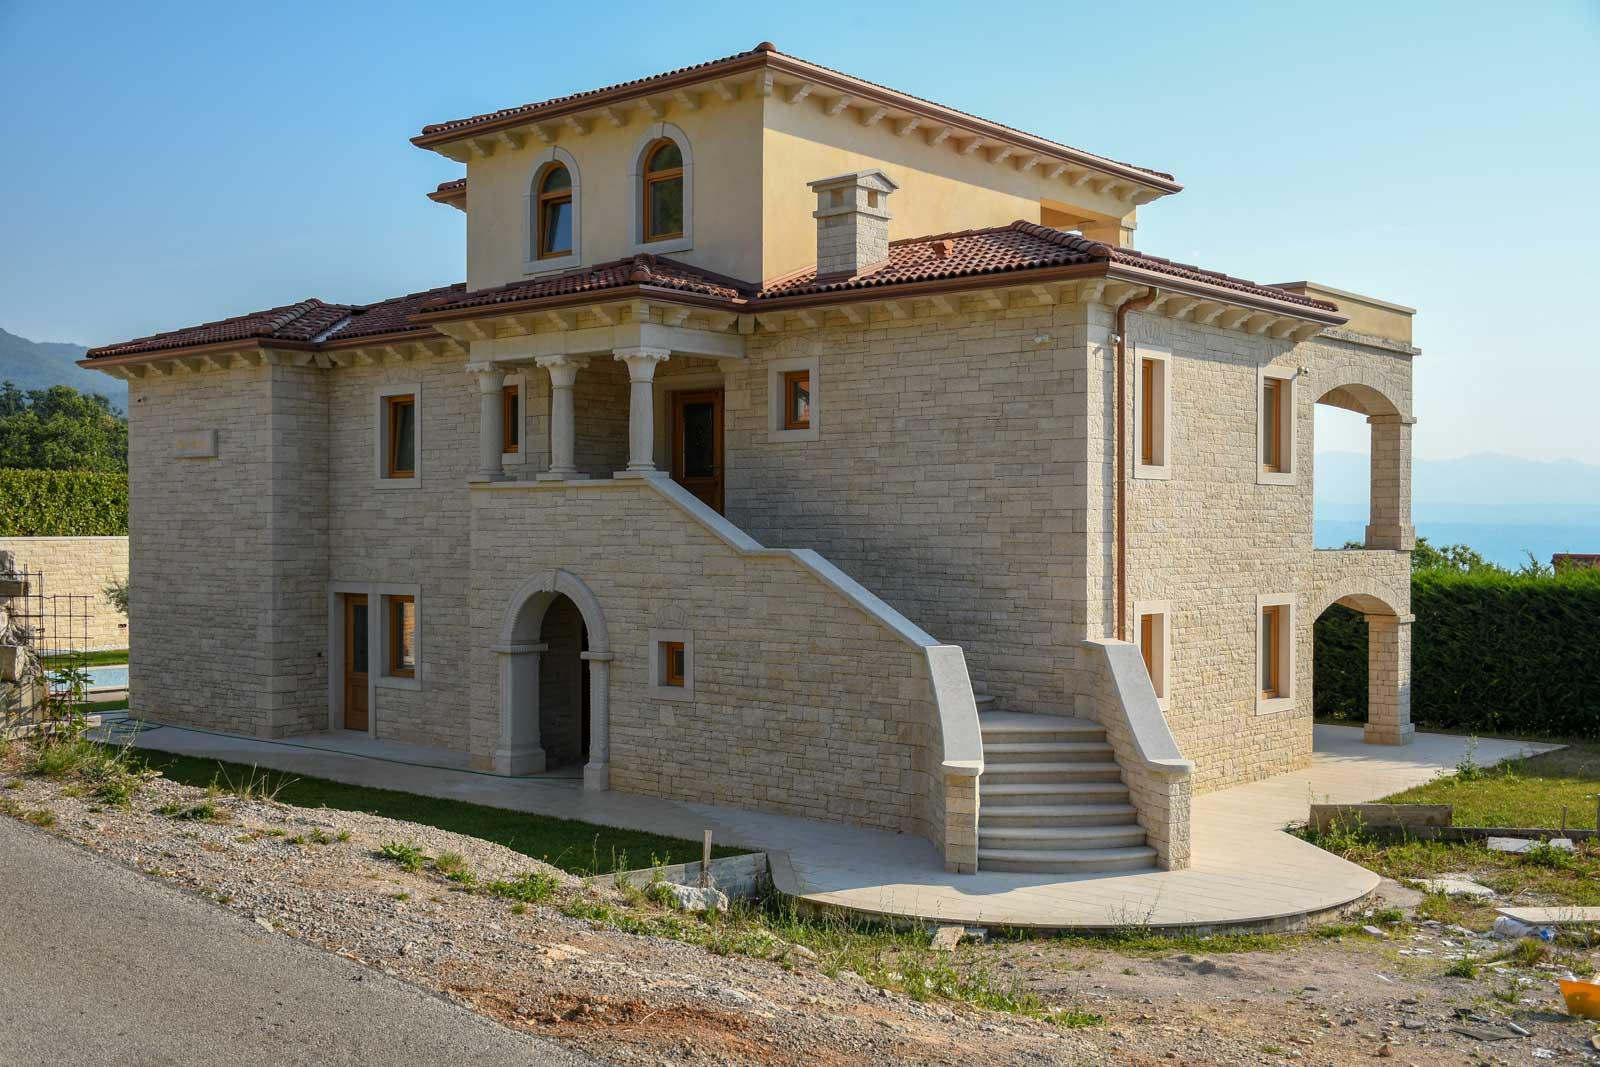 Luxusvillen Opatija Farkaš verkauft eine exklusive Villa mit Swimmingpool in der Nähe von Opatija